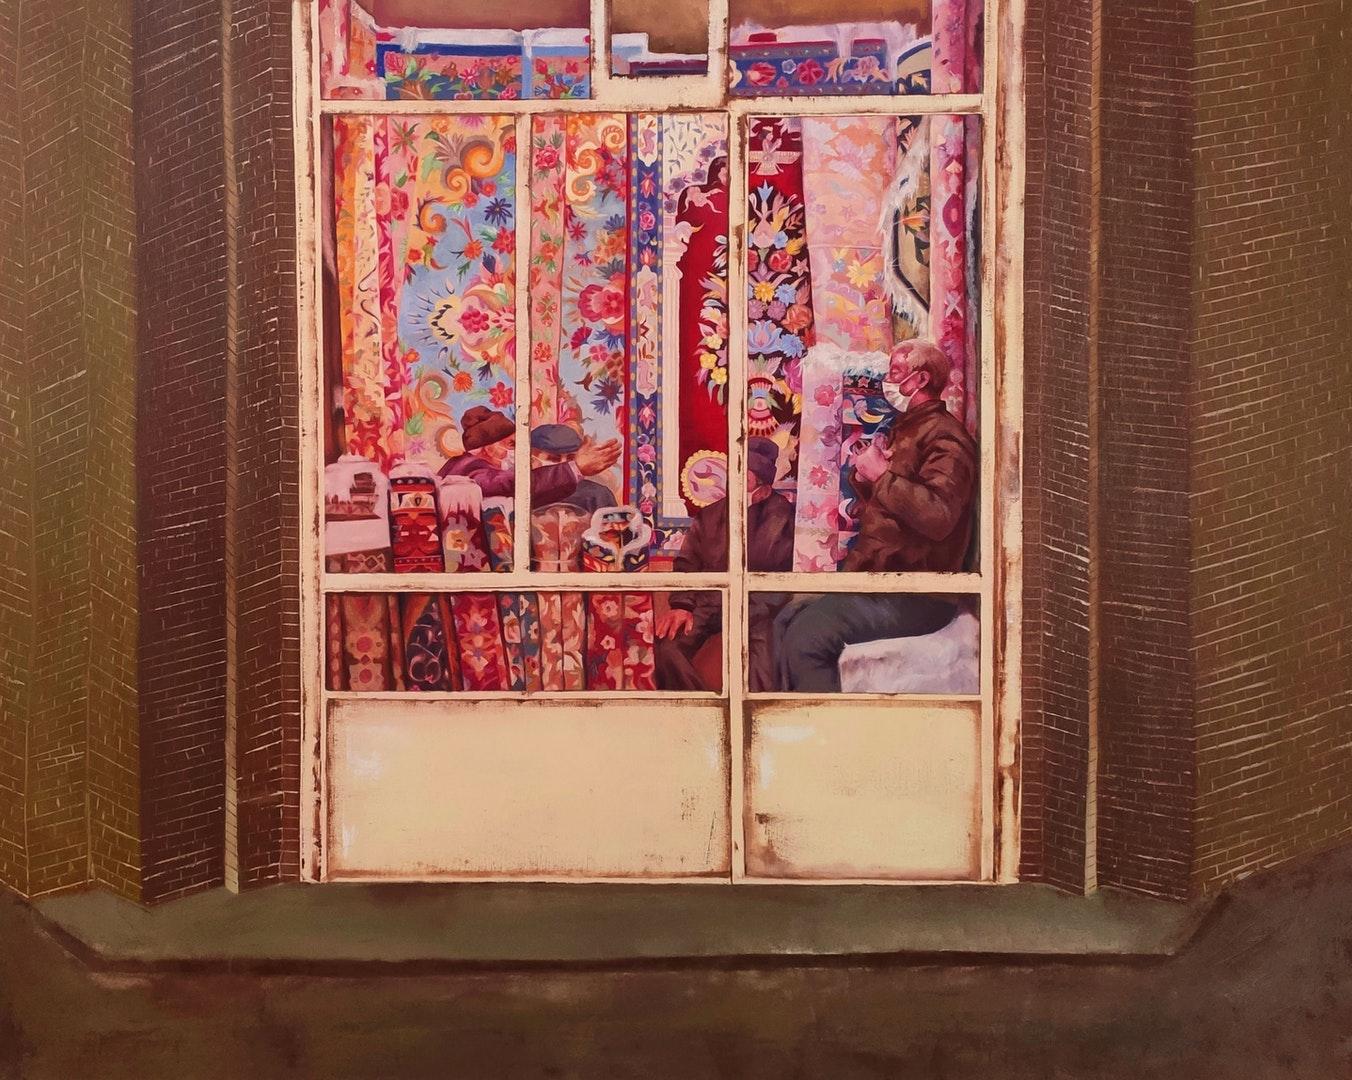 'Carpet Seller', Ayda Salami, Oil on canvas, 100 x 80 cm